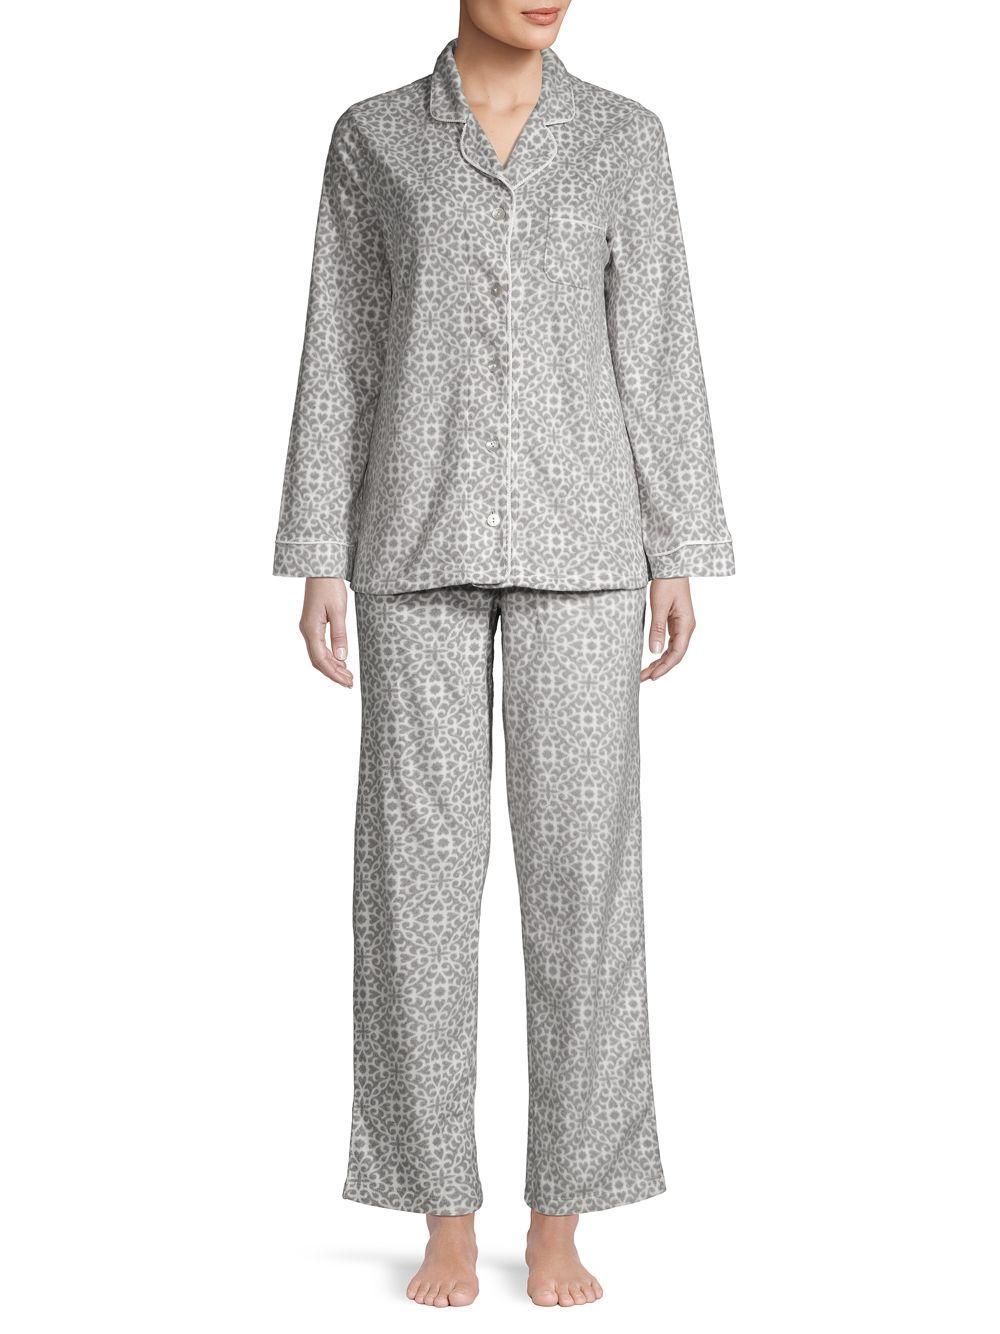 bf3f9c1731e2 Carole Hochman 2-piece Printed Pajama Set in Gray - Lyst